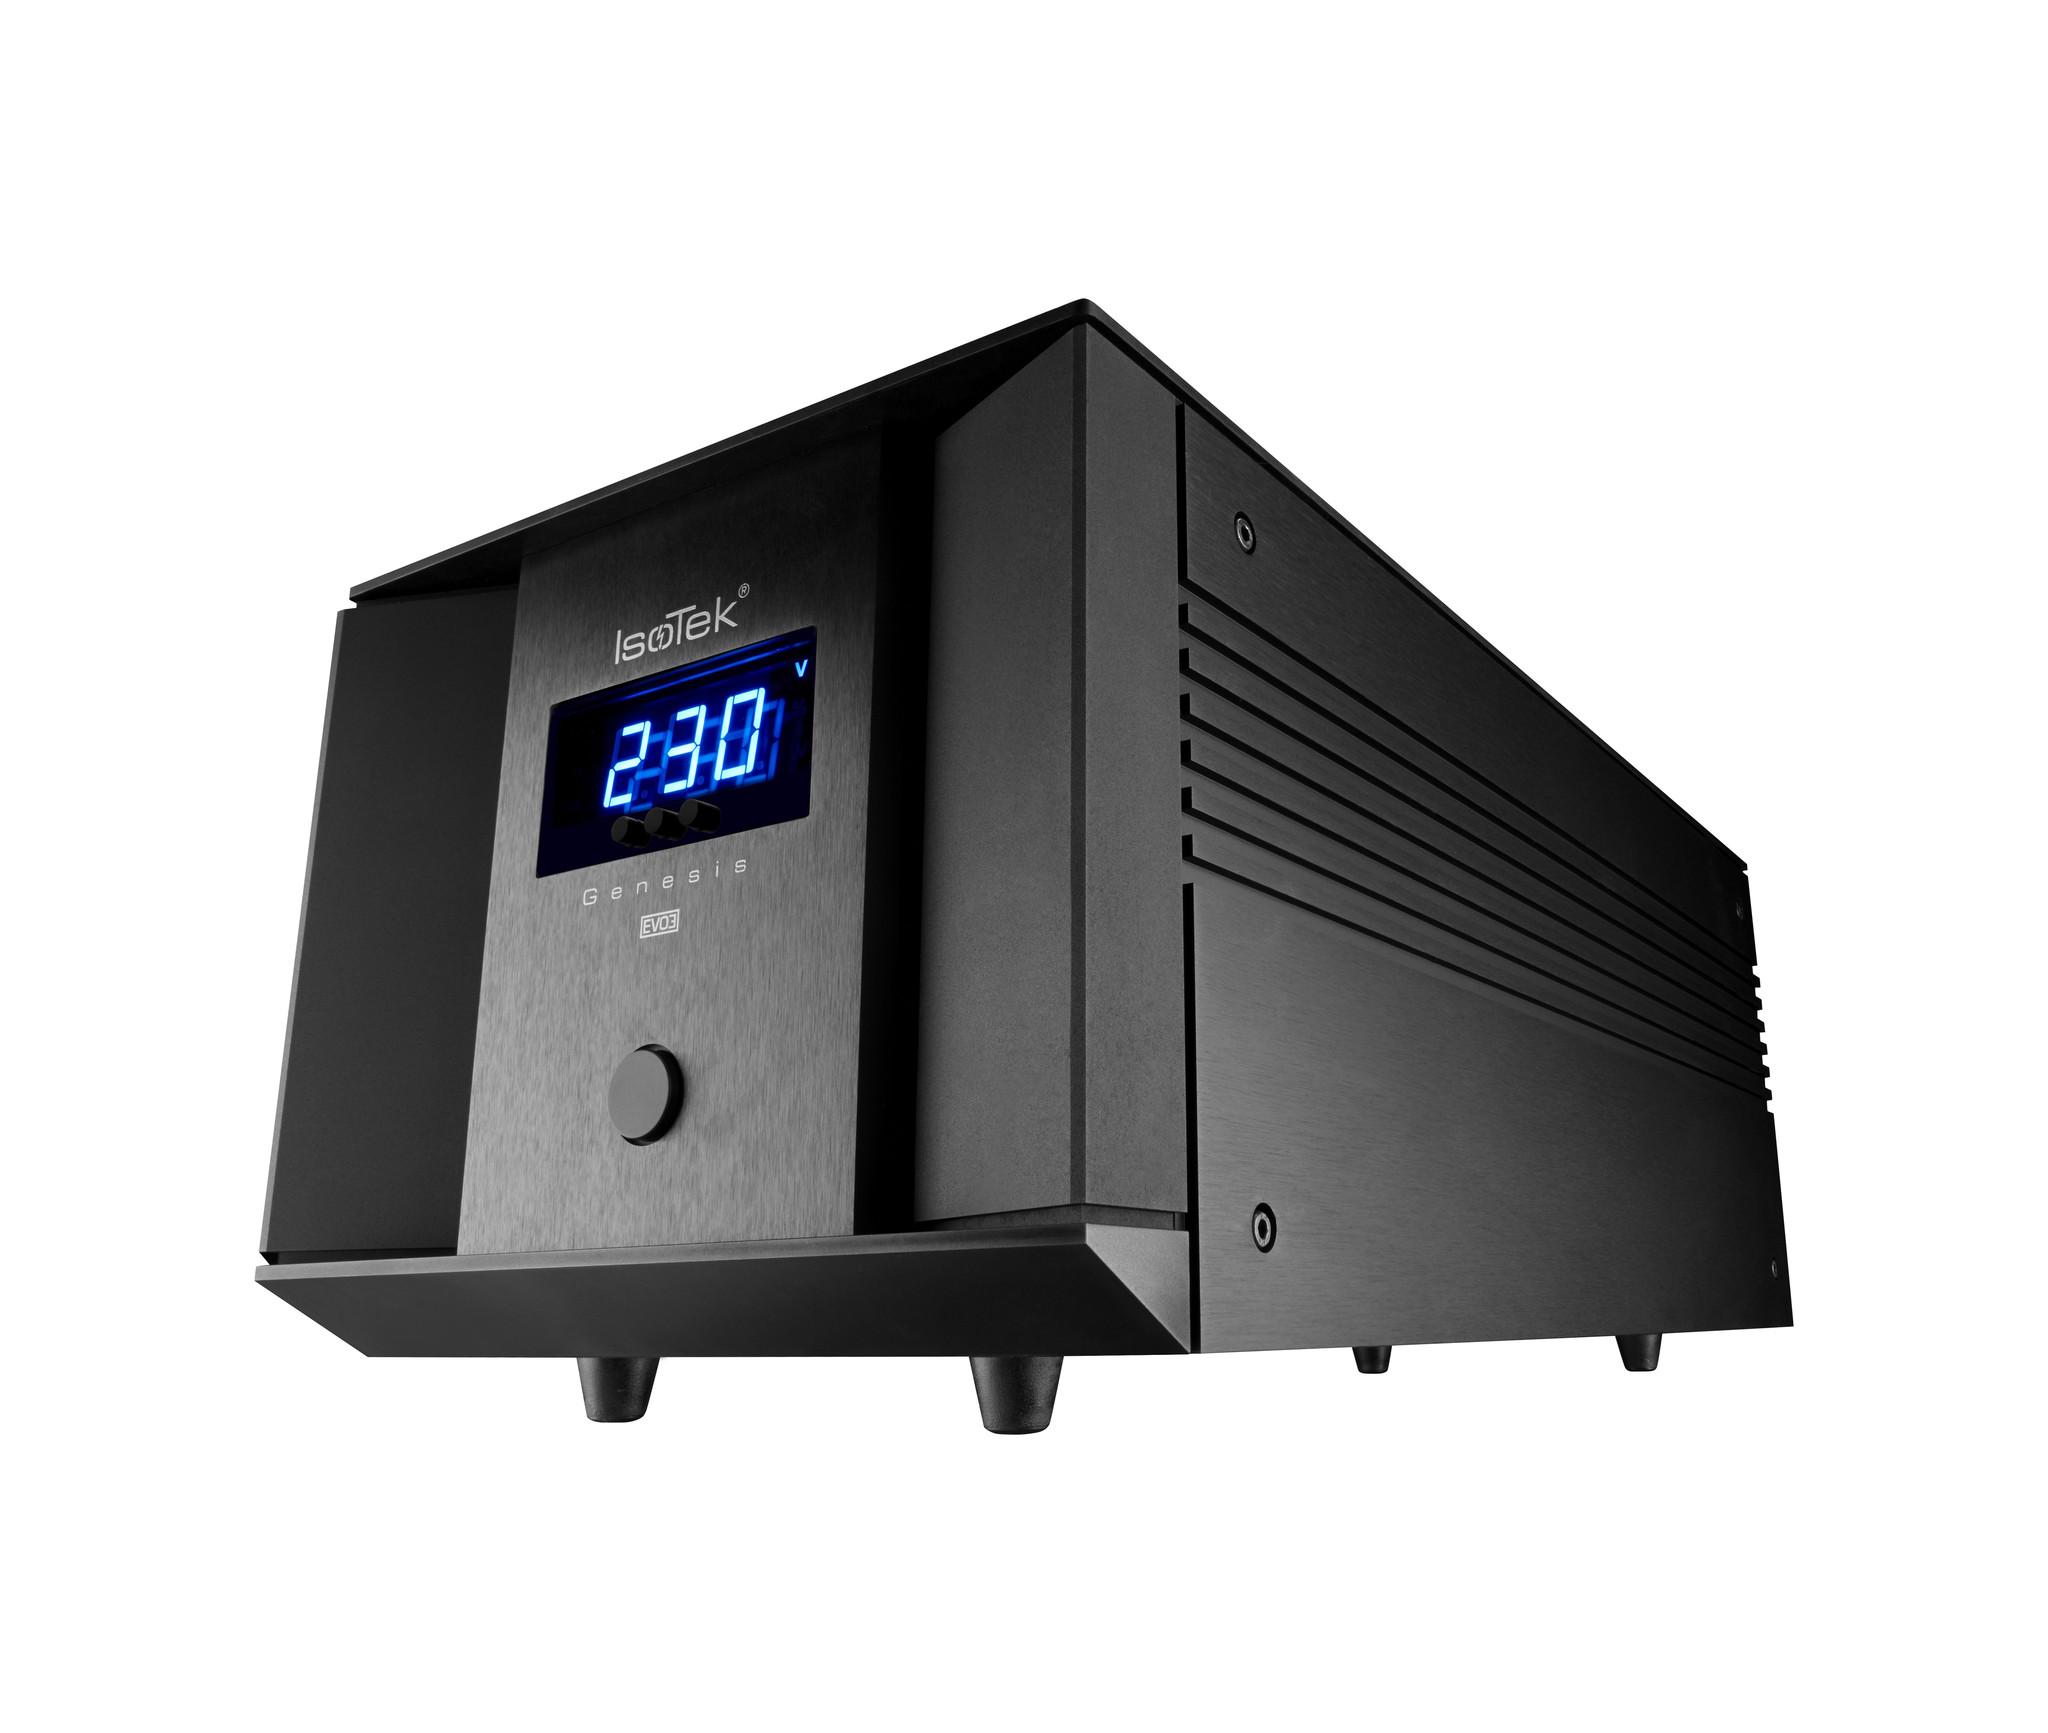 IsoTek Power Conditioners Mosaic Series